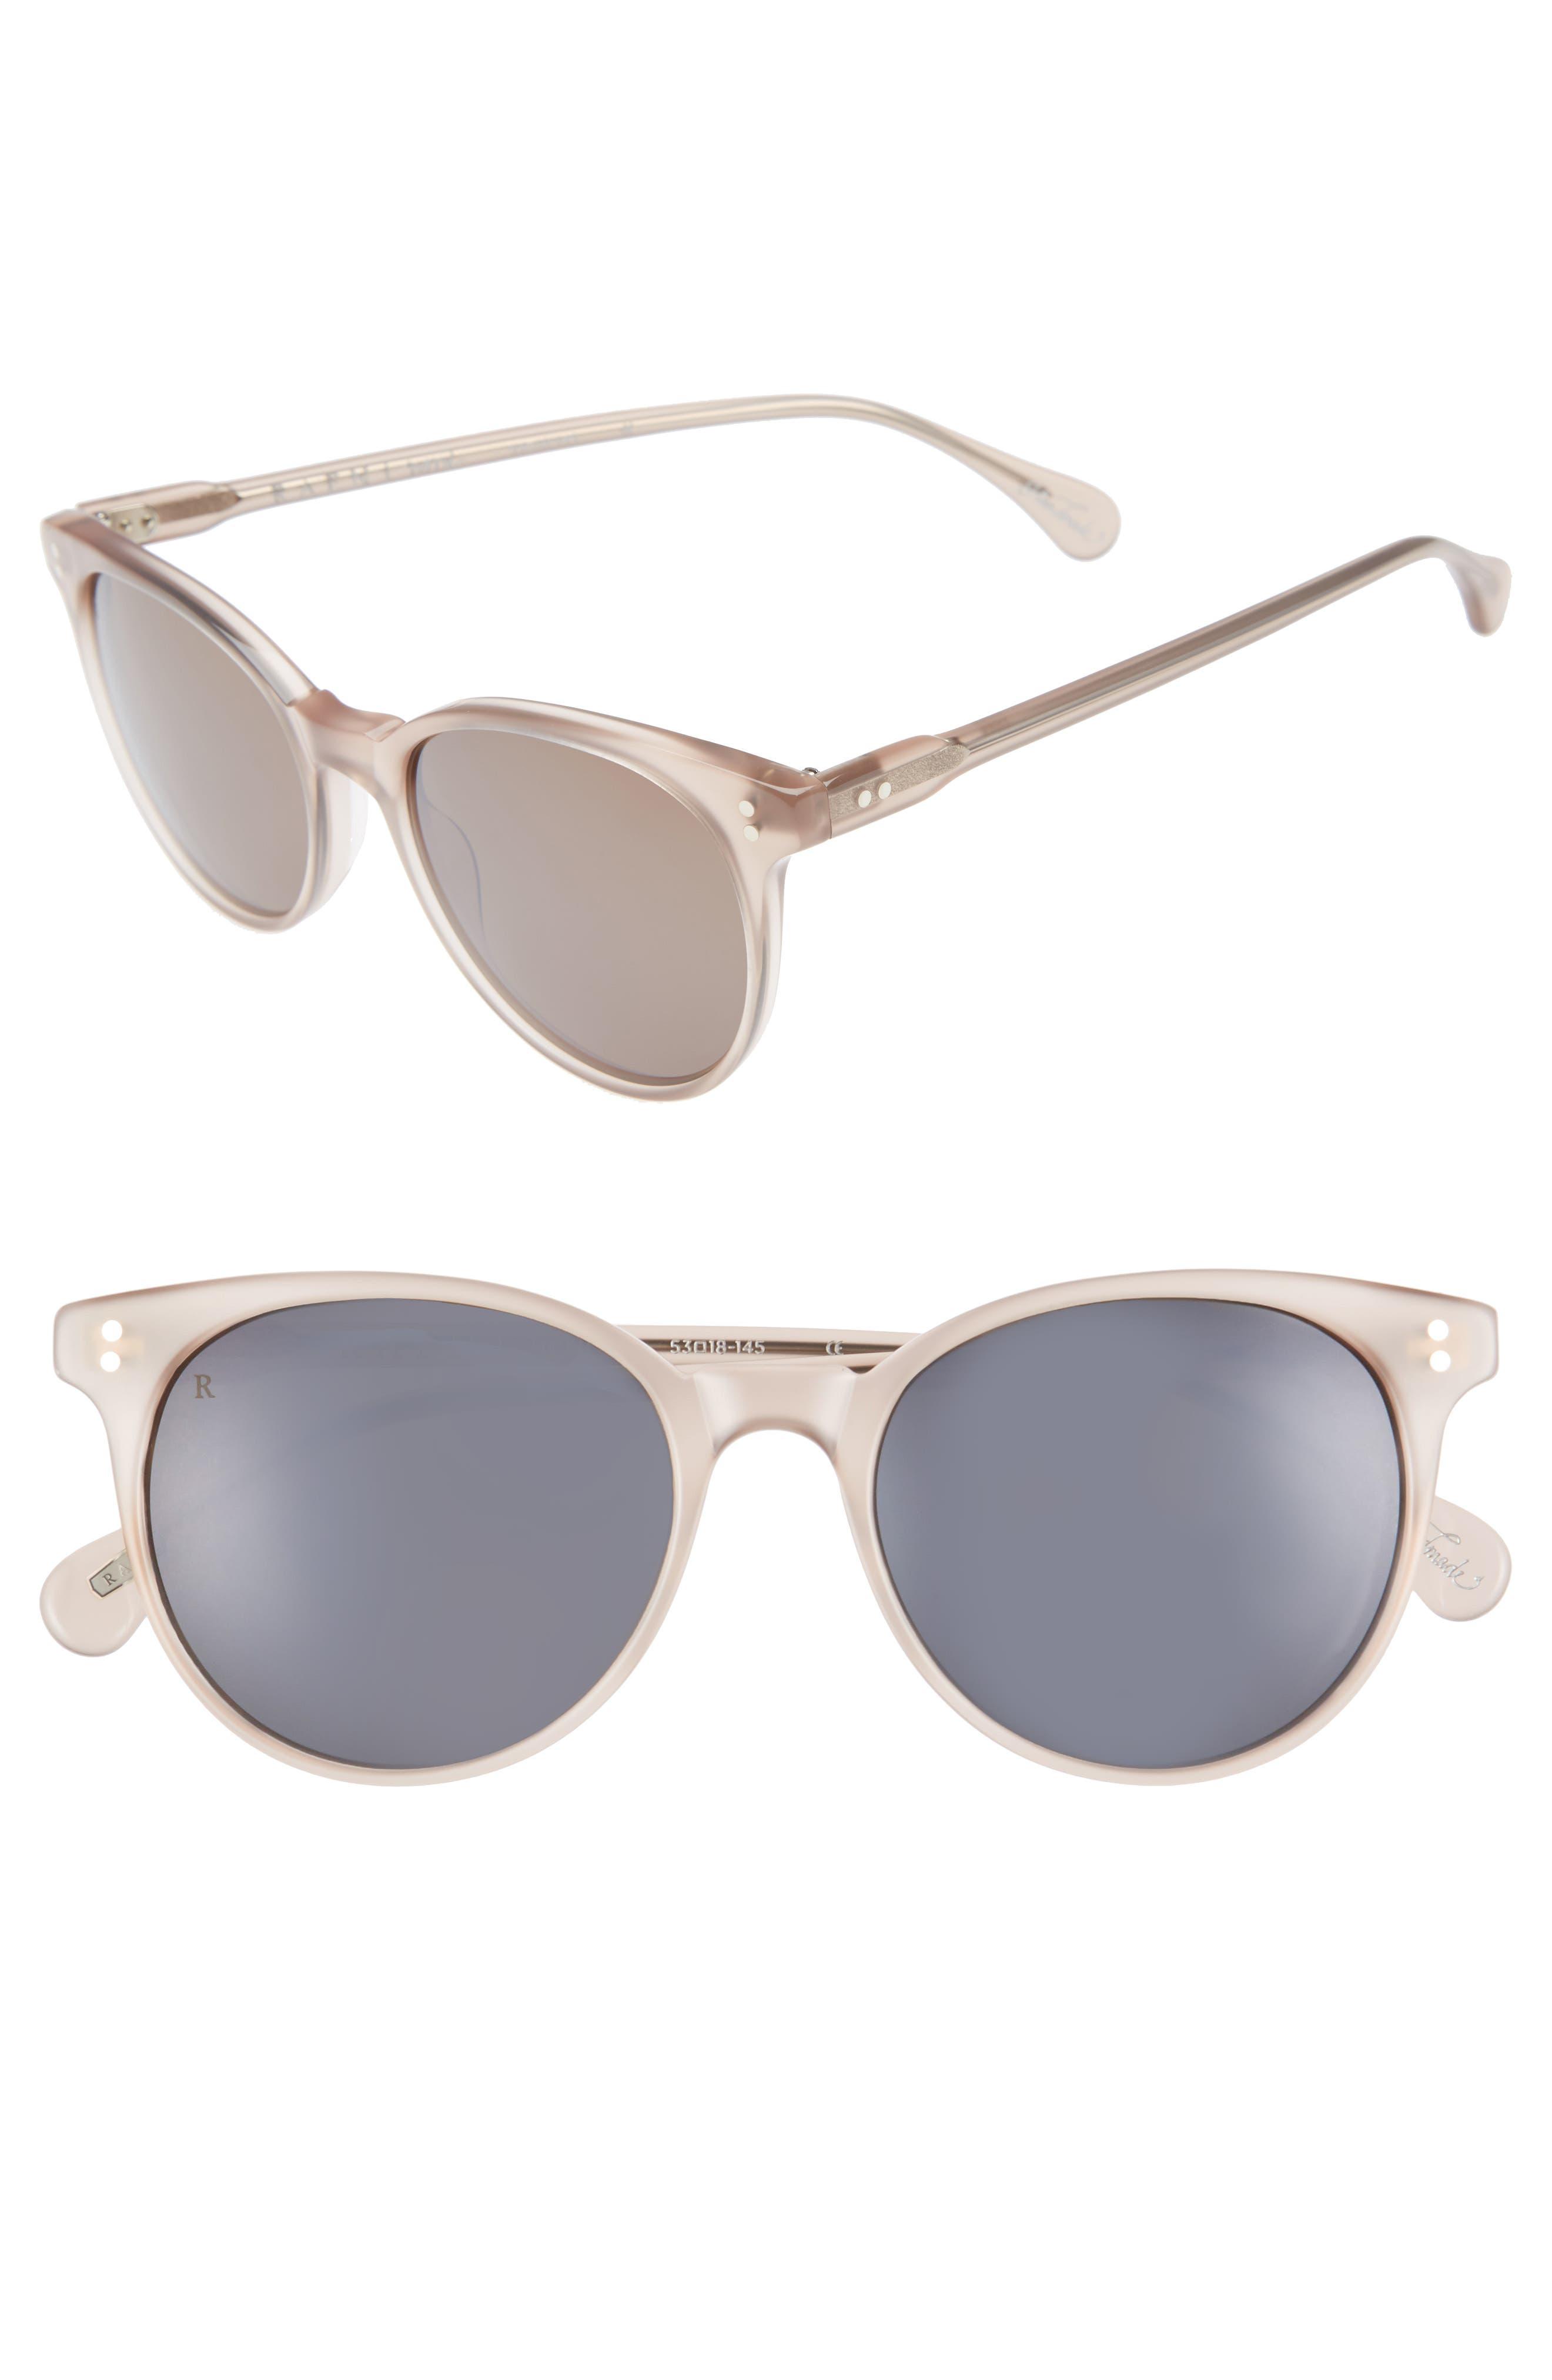 Main Image - RAEN Norie 51mm Cat Eye Mirrored Lens Sunglasses